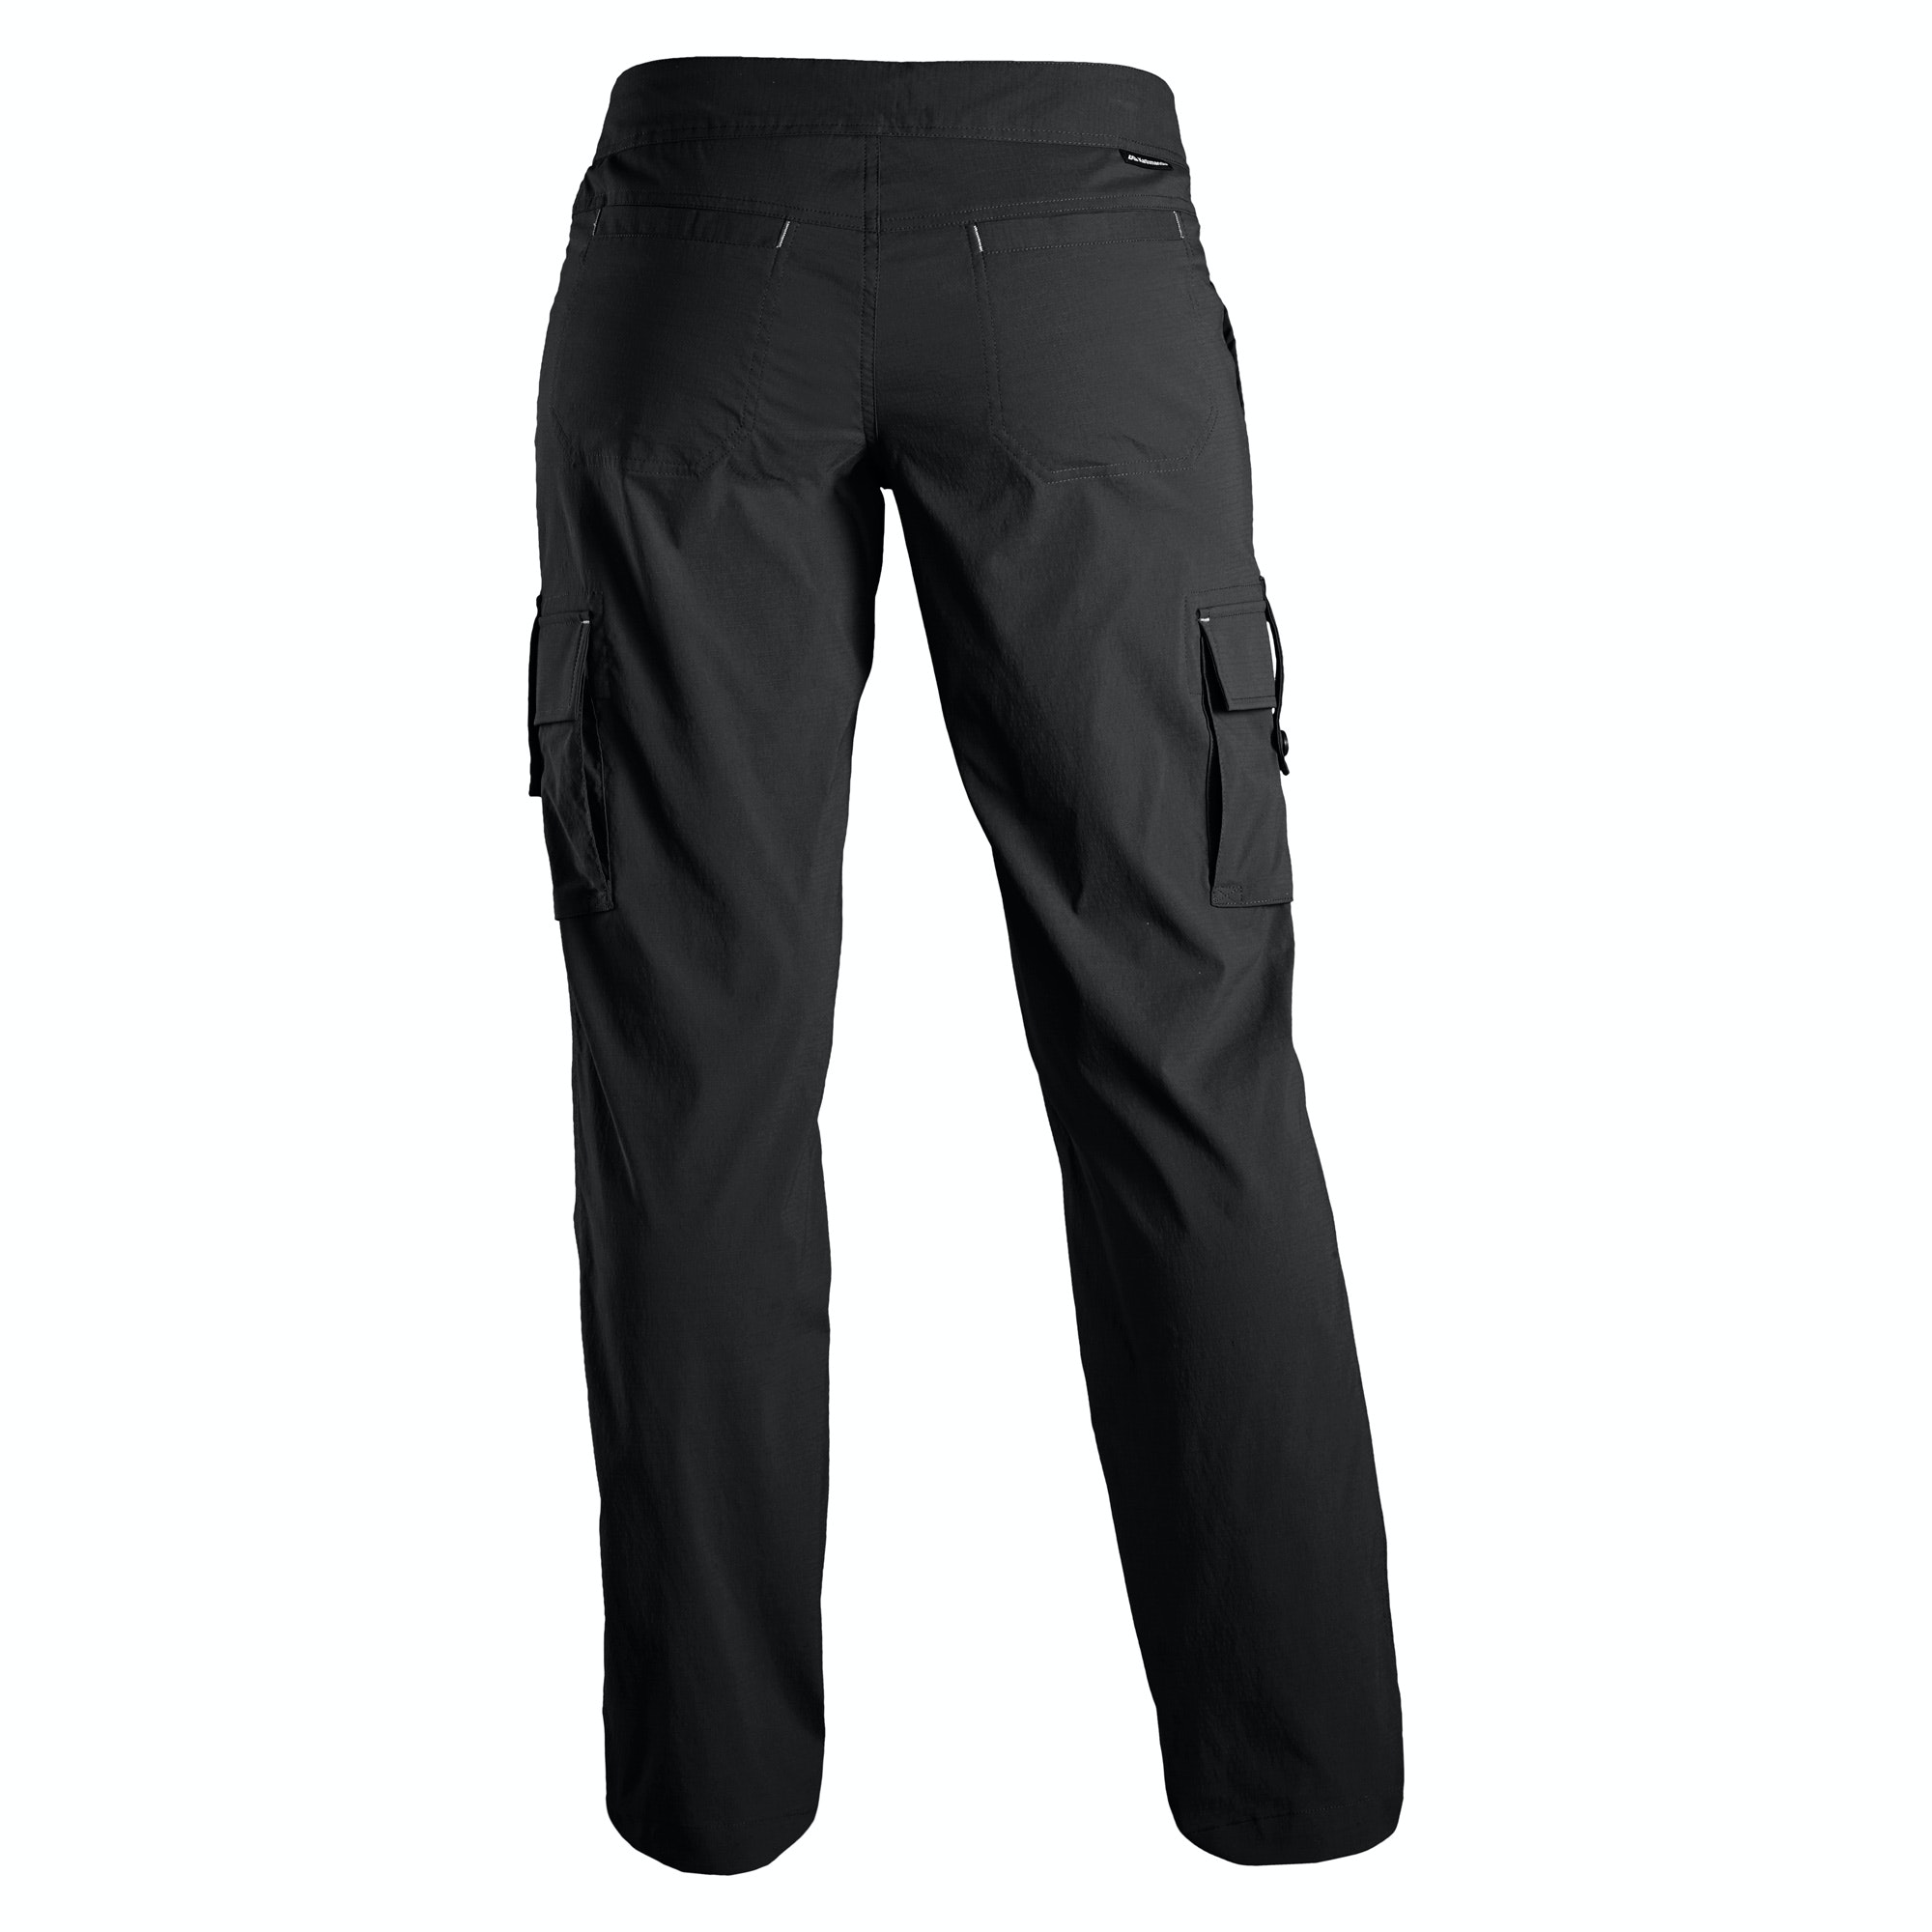 NEW-Kathmandu-Miro-Women-039-s-quickDRY-Pants-Trousers-Stretch-Travel-Cargo-Recycled thumbnail 8